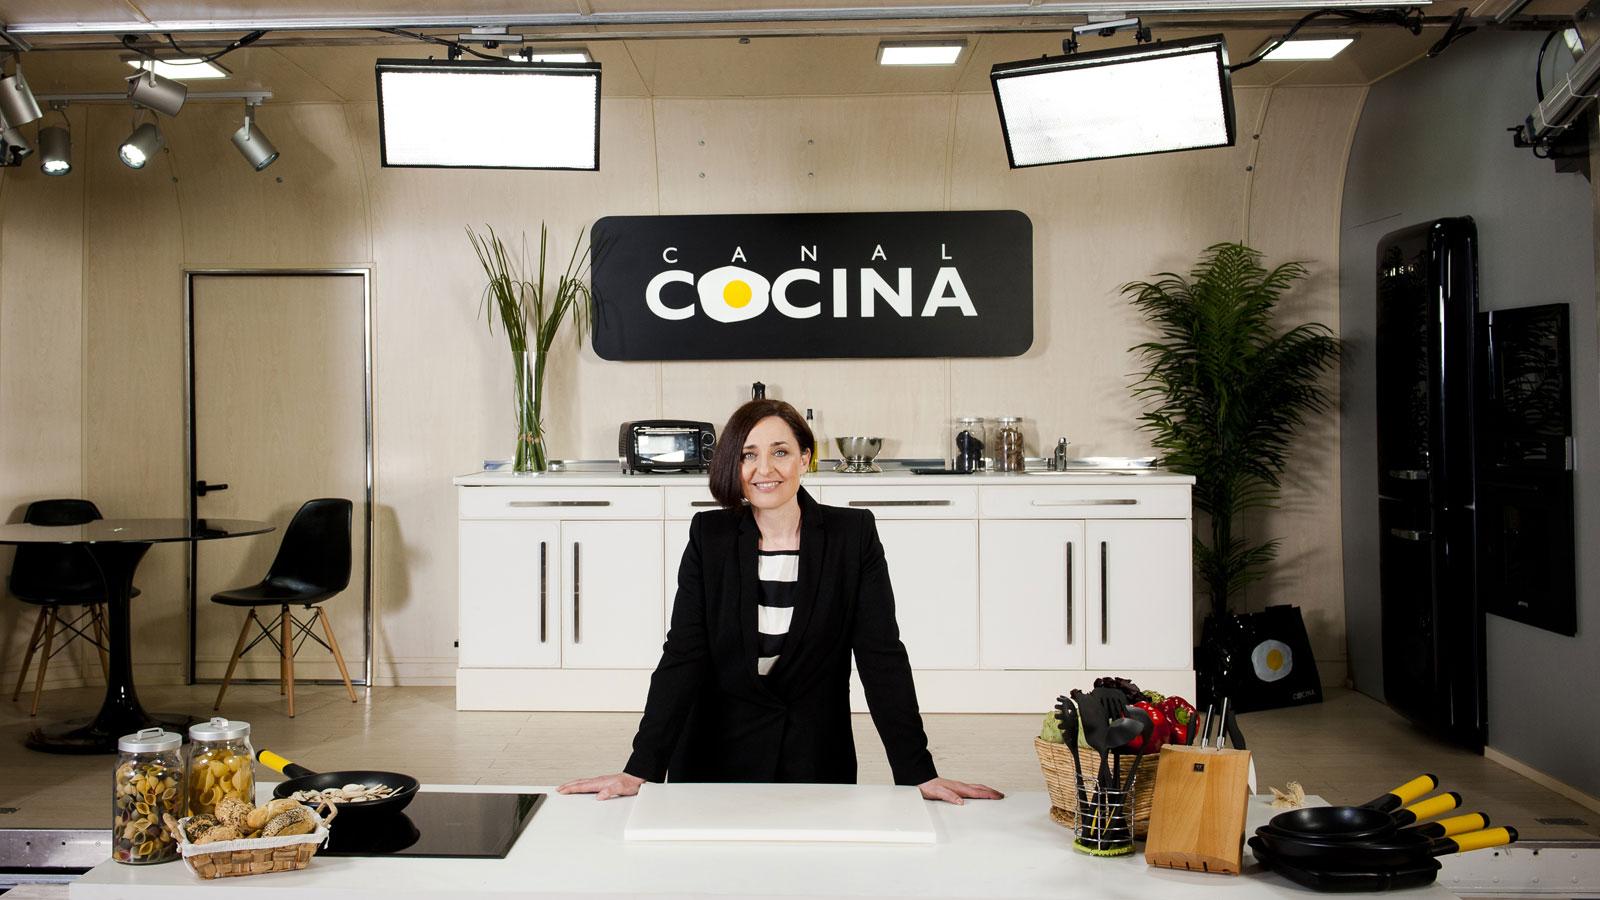 La caravana de canal cocina viaja hasta huelva capital - Canal de cocina ...